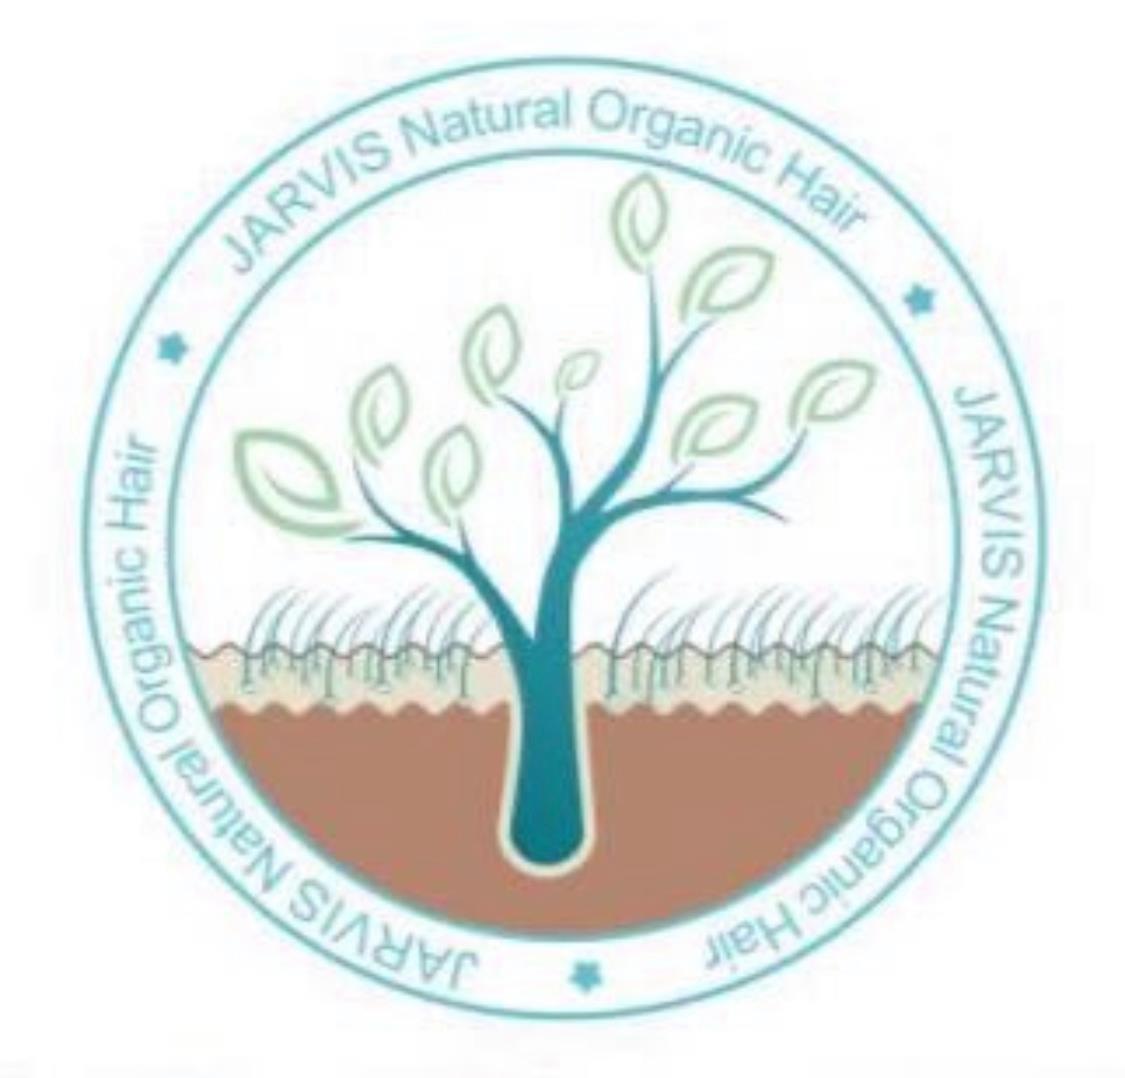 Jarvis Natural Organic Hair